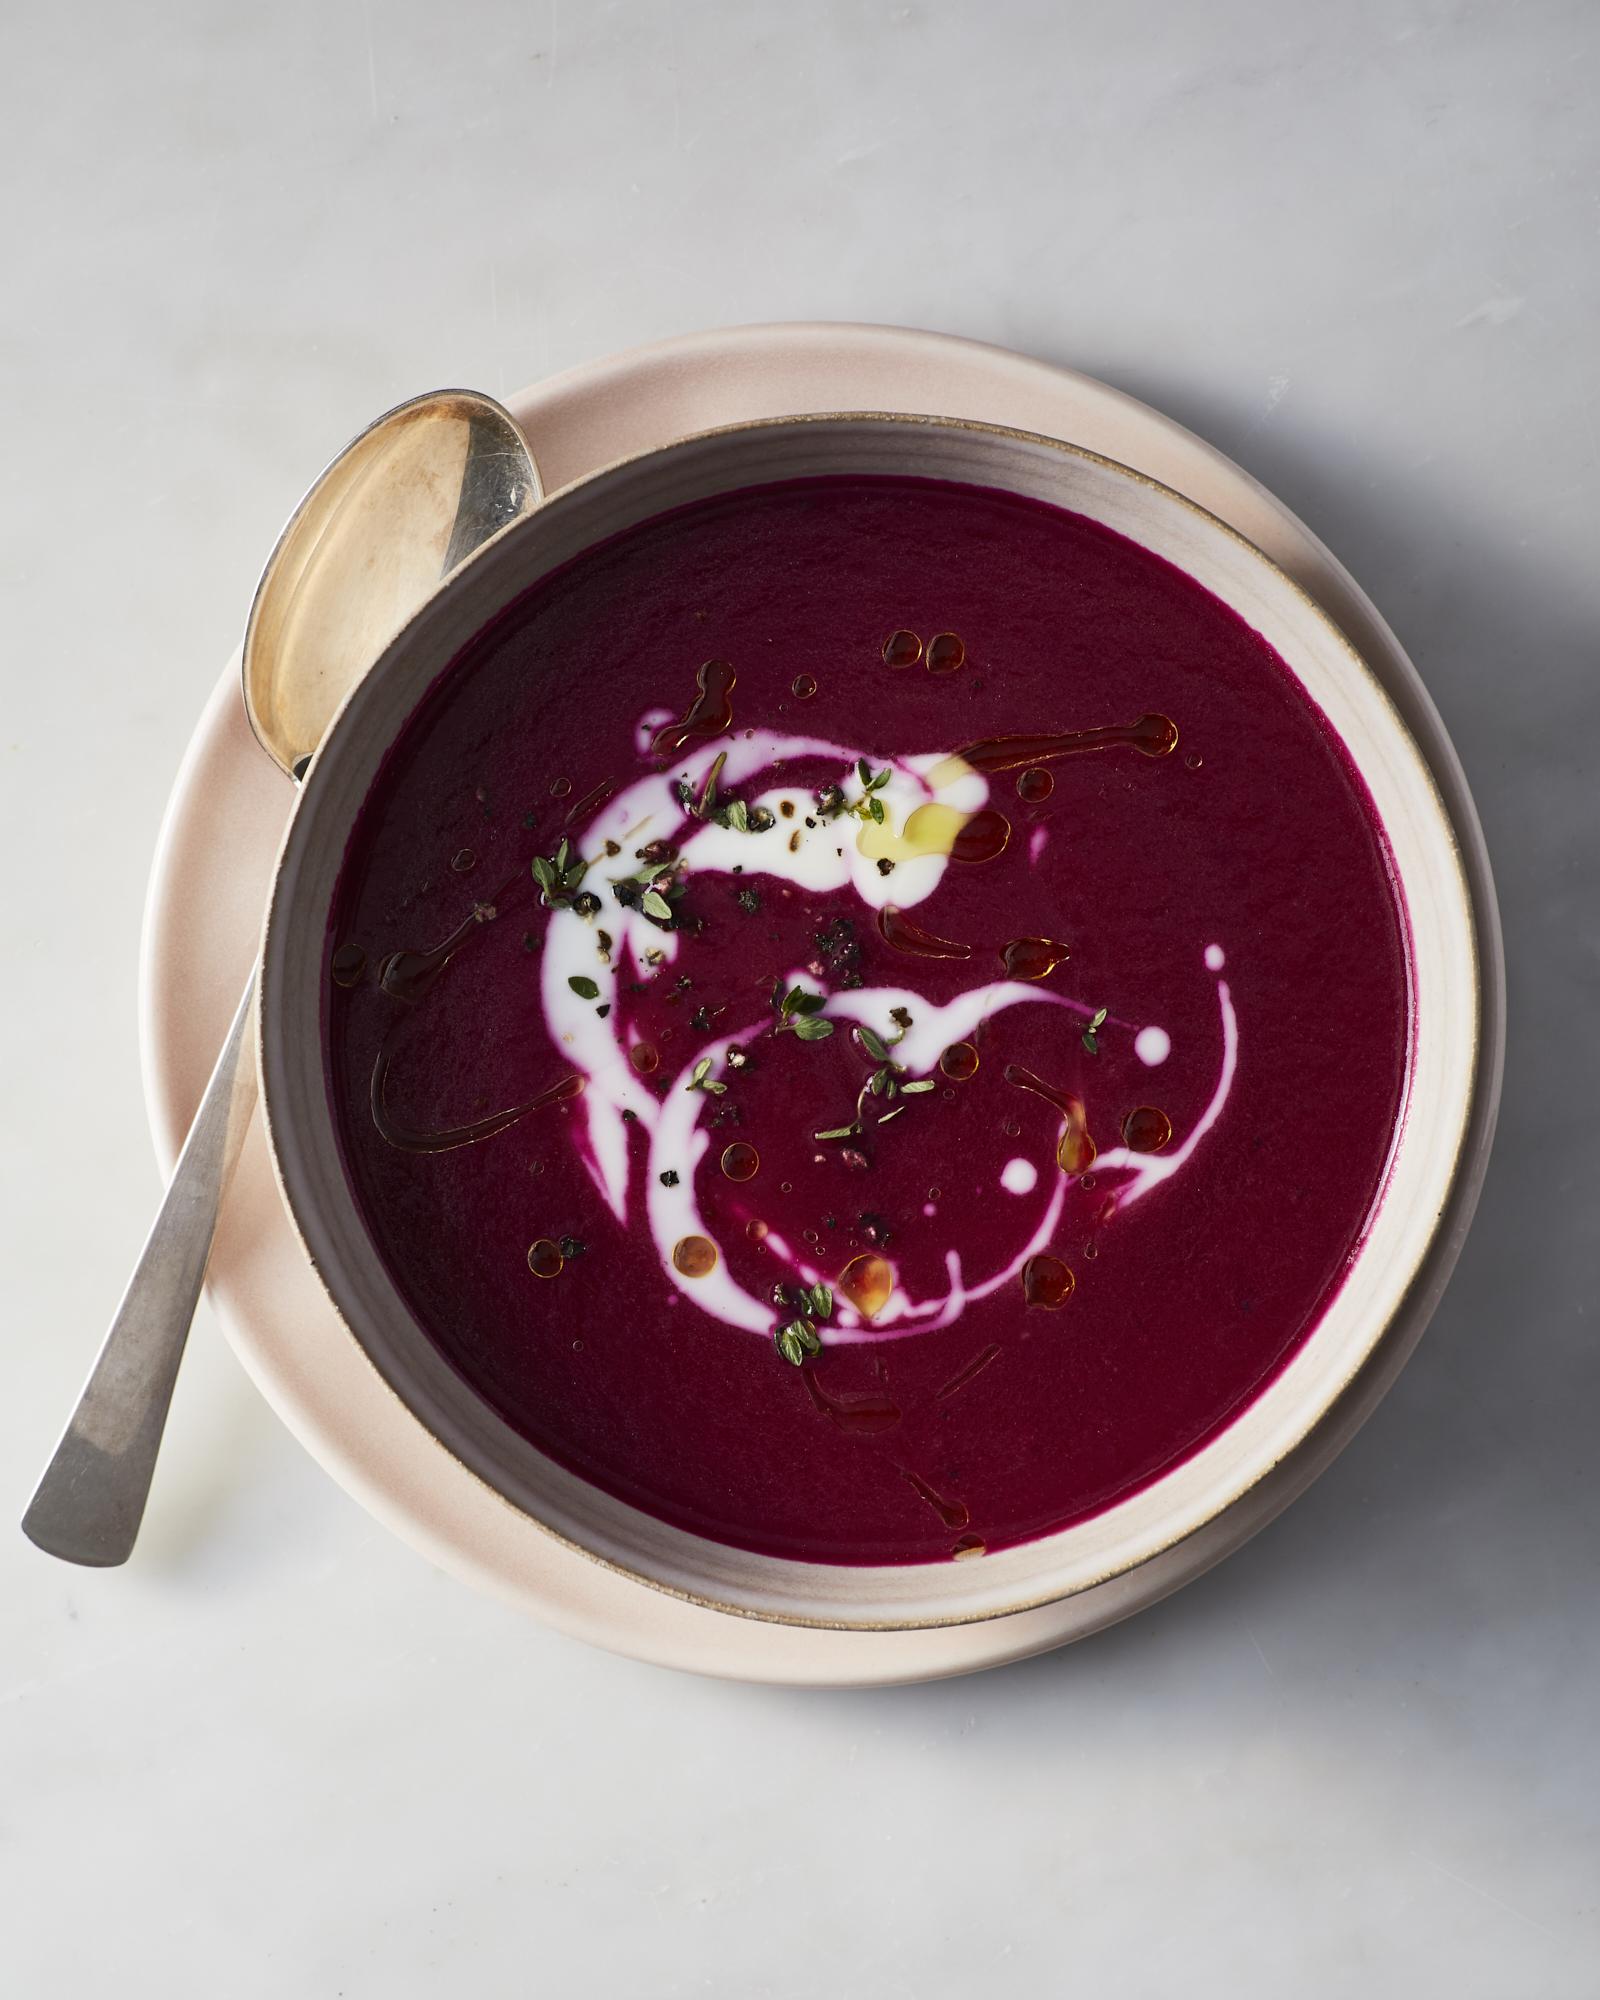 Ginger-Beet-Soup-V2-017-JF-6409899.jpg